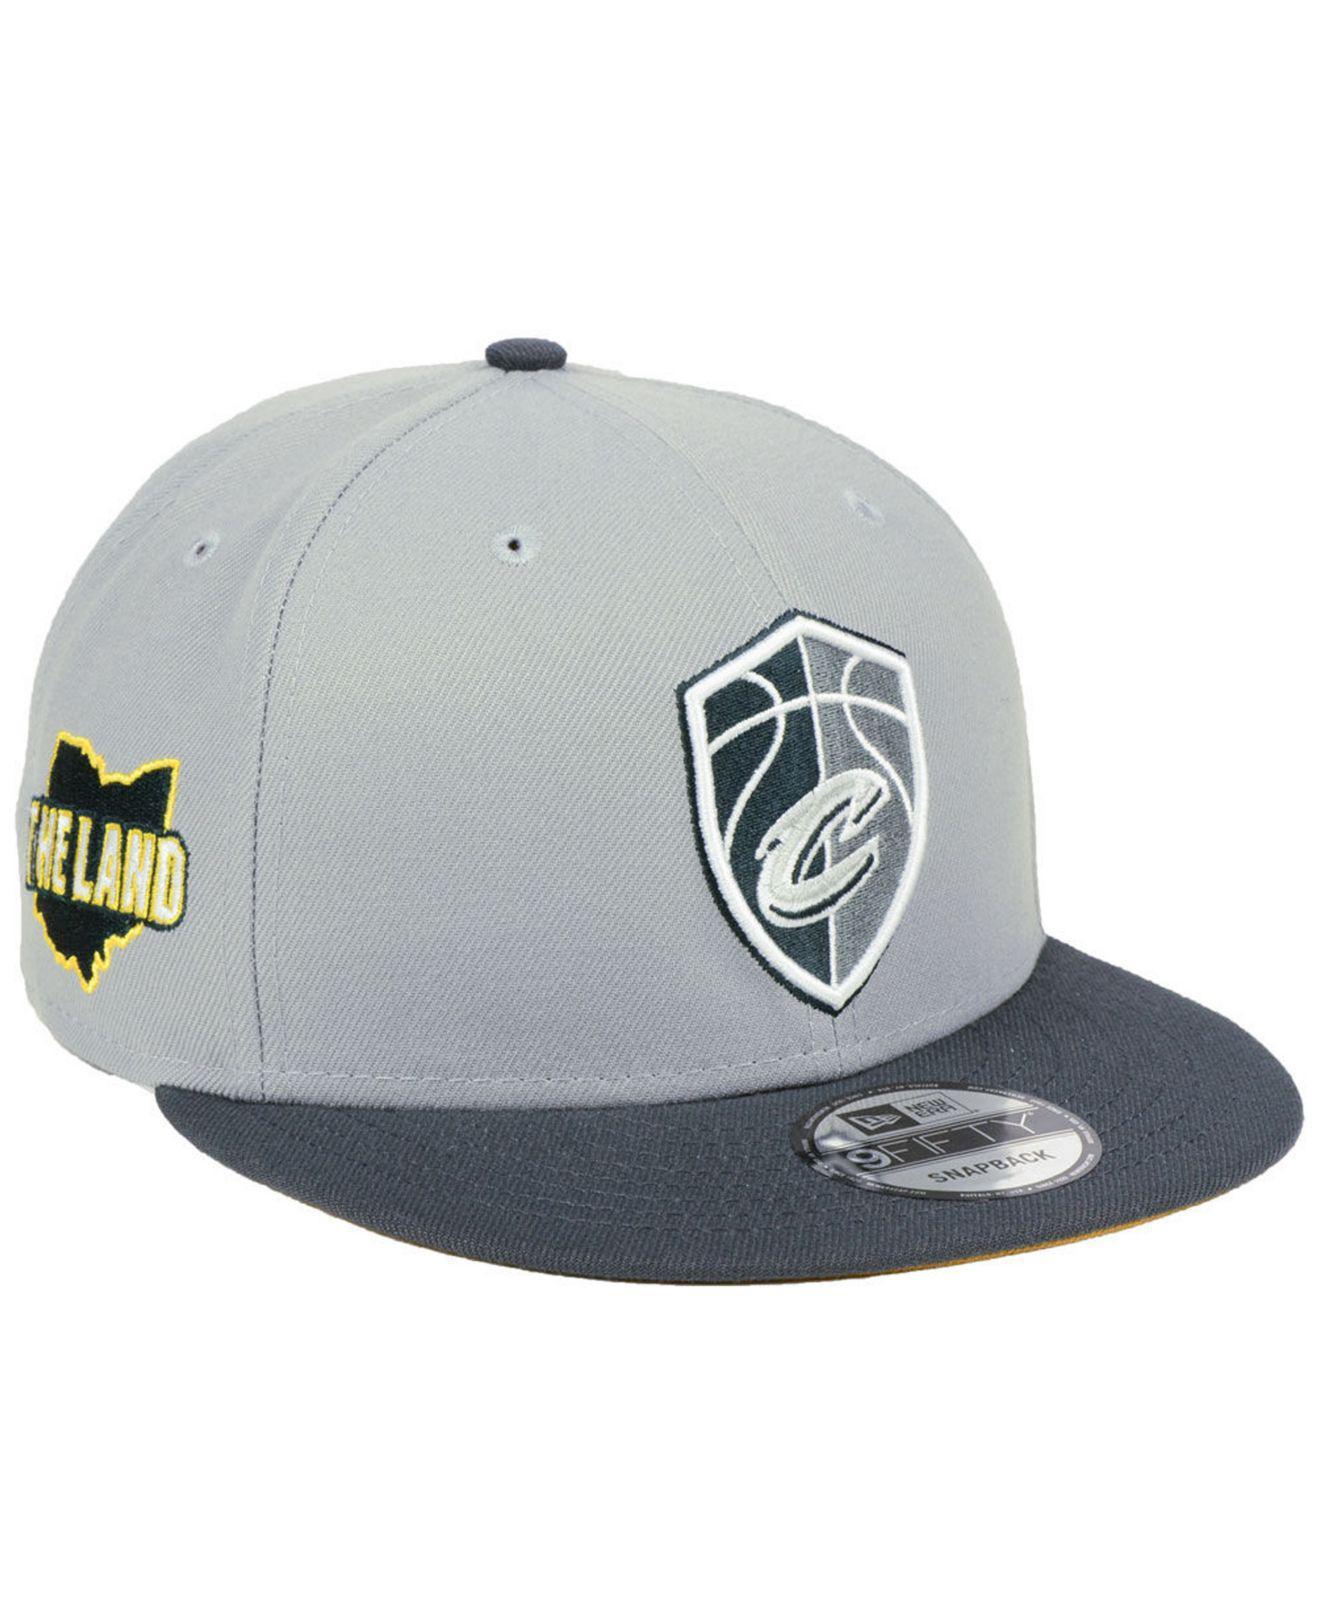 b5fd28bafbb Lyst - KTZ Cleveland Cavaliers City Series 9fifty Snapback Cap in ...